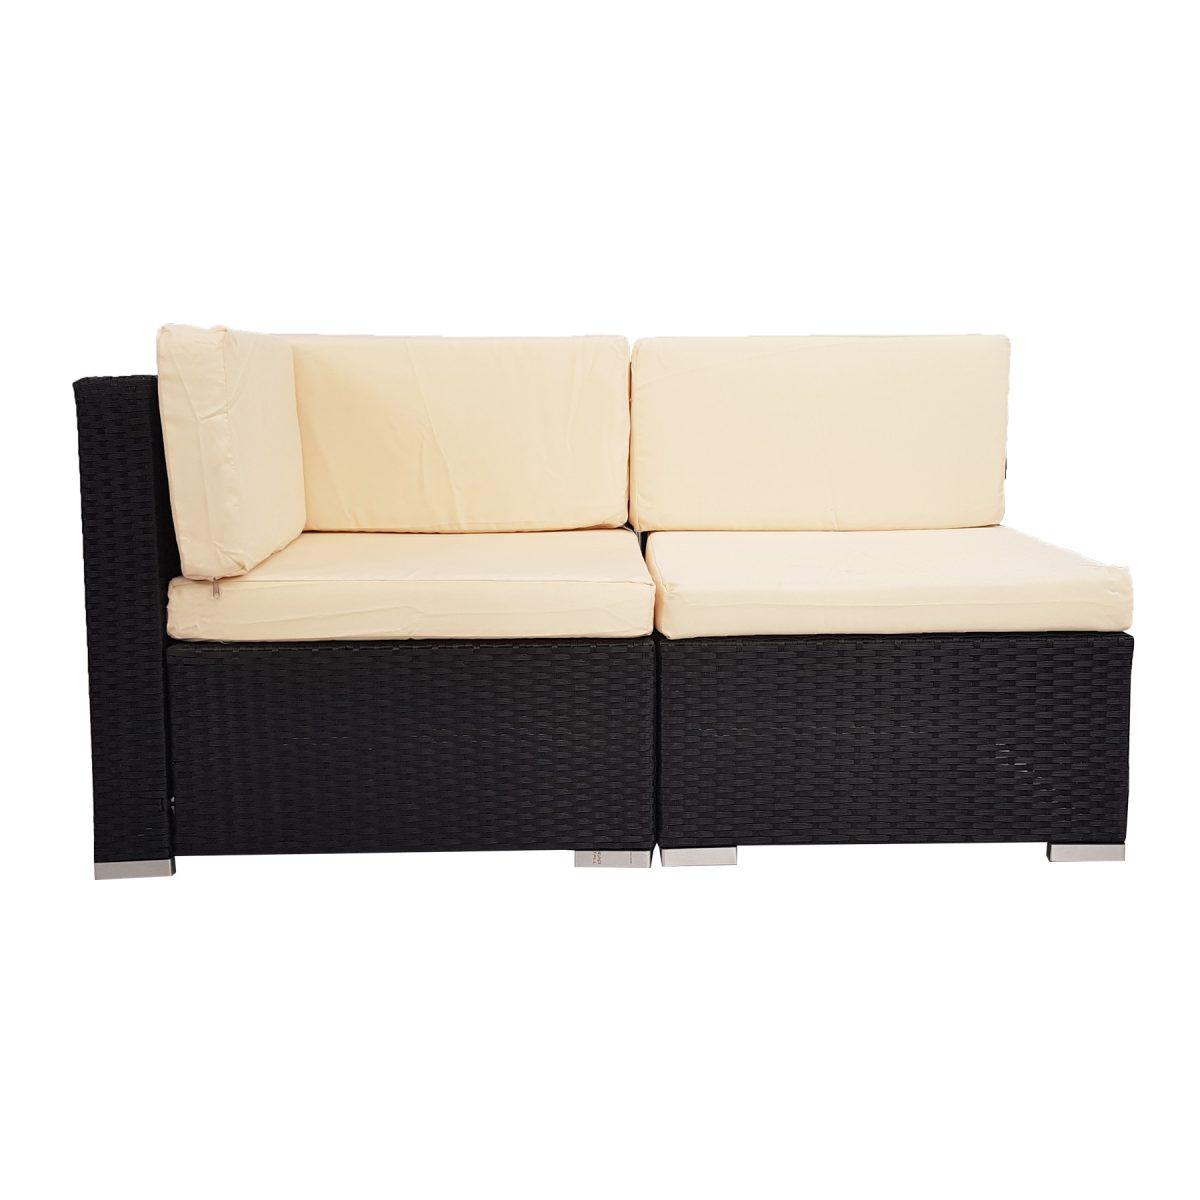 2 Piece White Rattan Wicker Outdoor Furniture Sofa Set